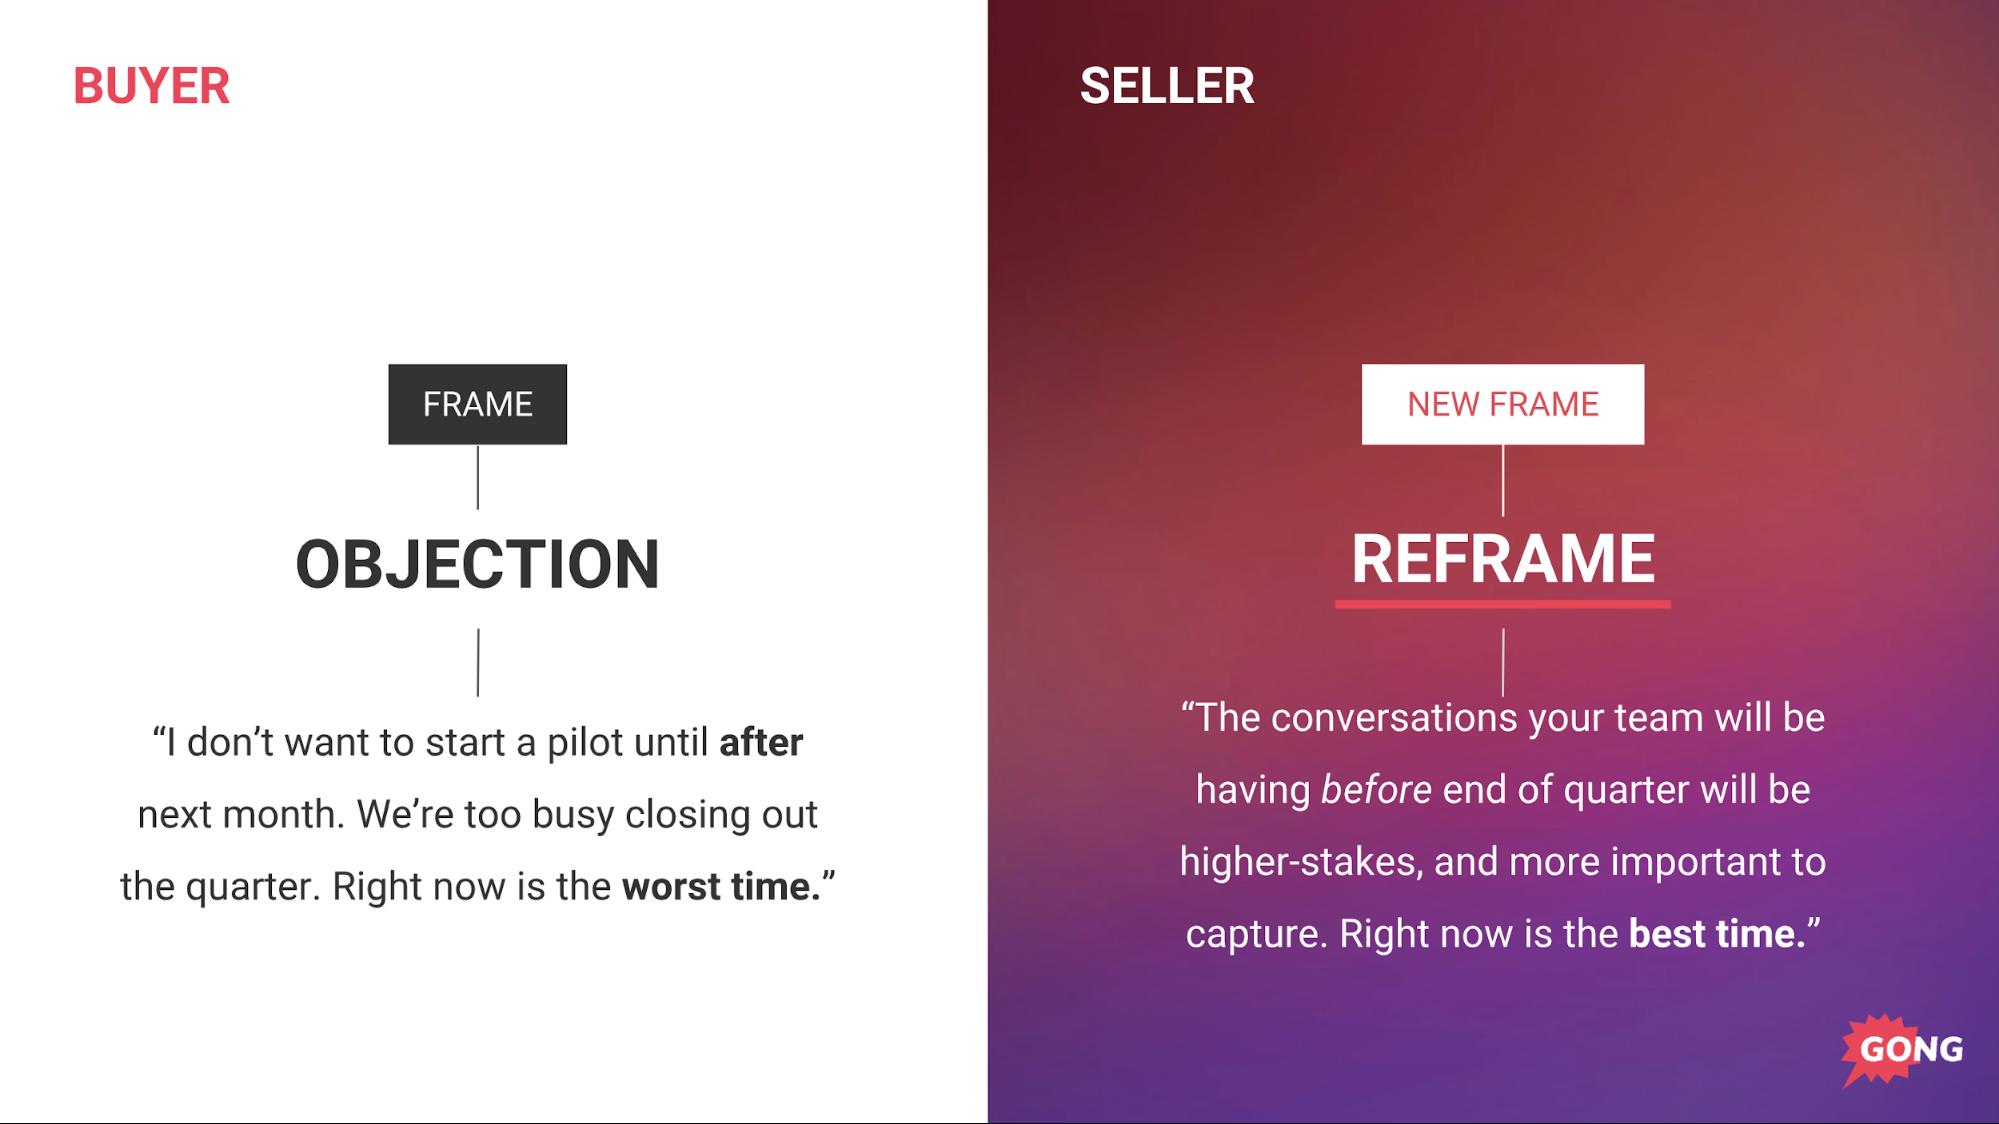 Reframe sales technique example